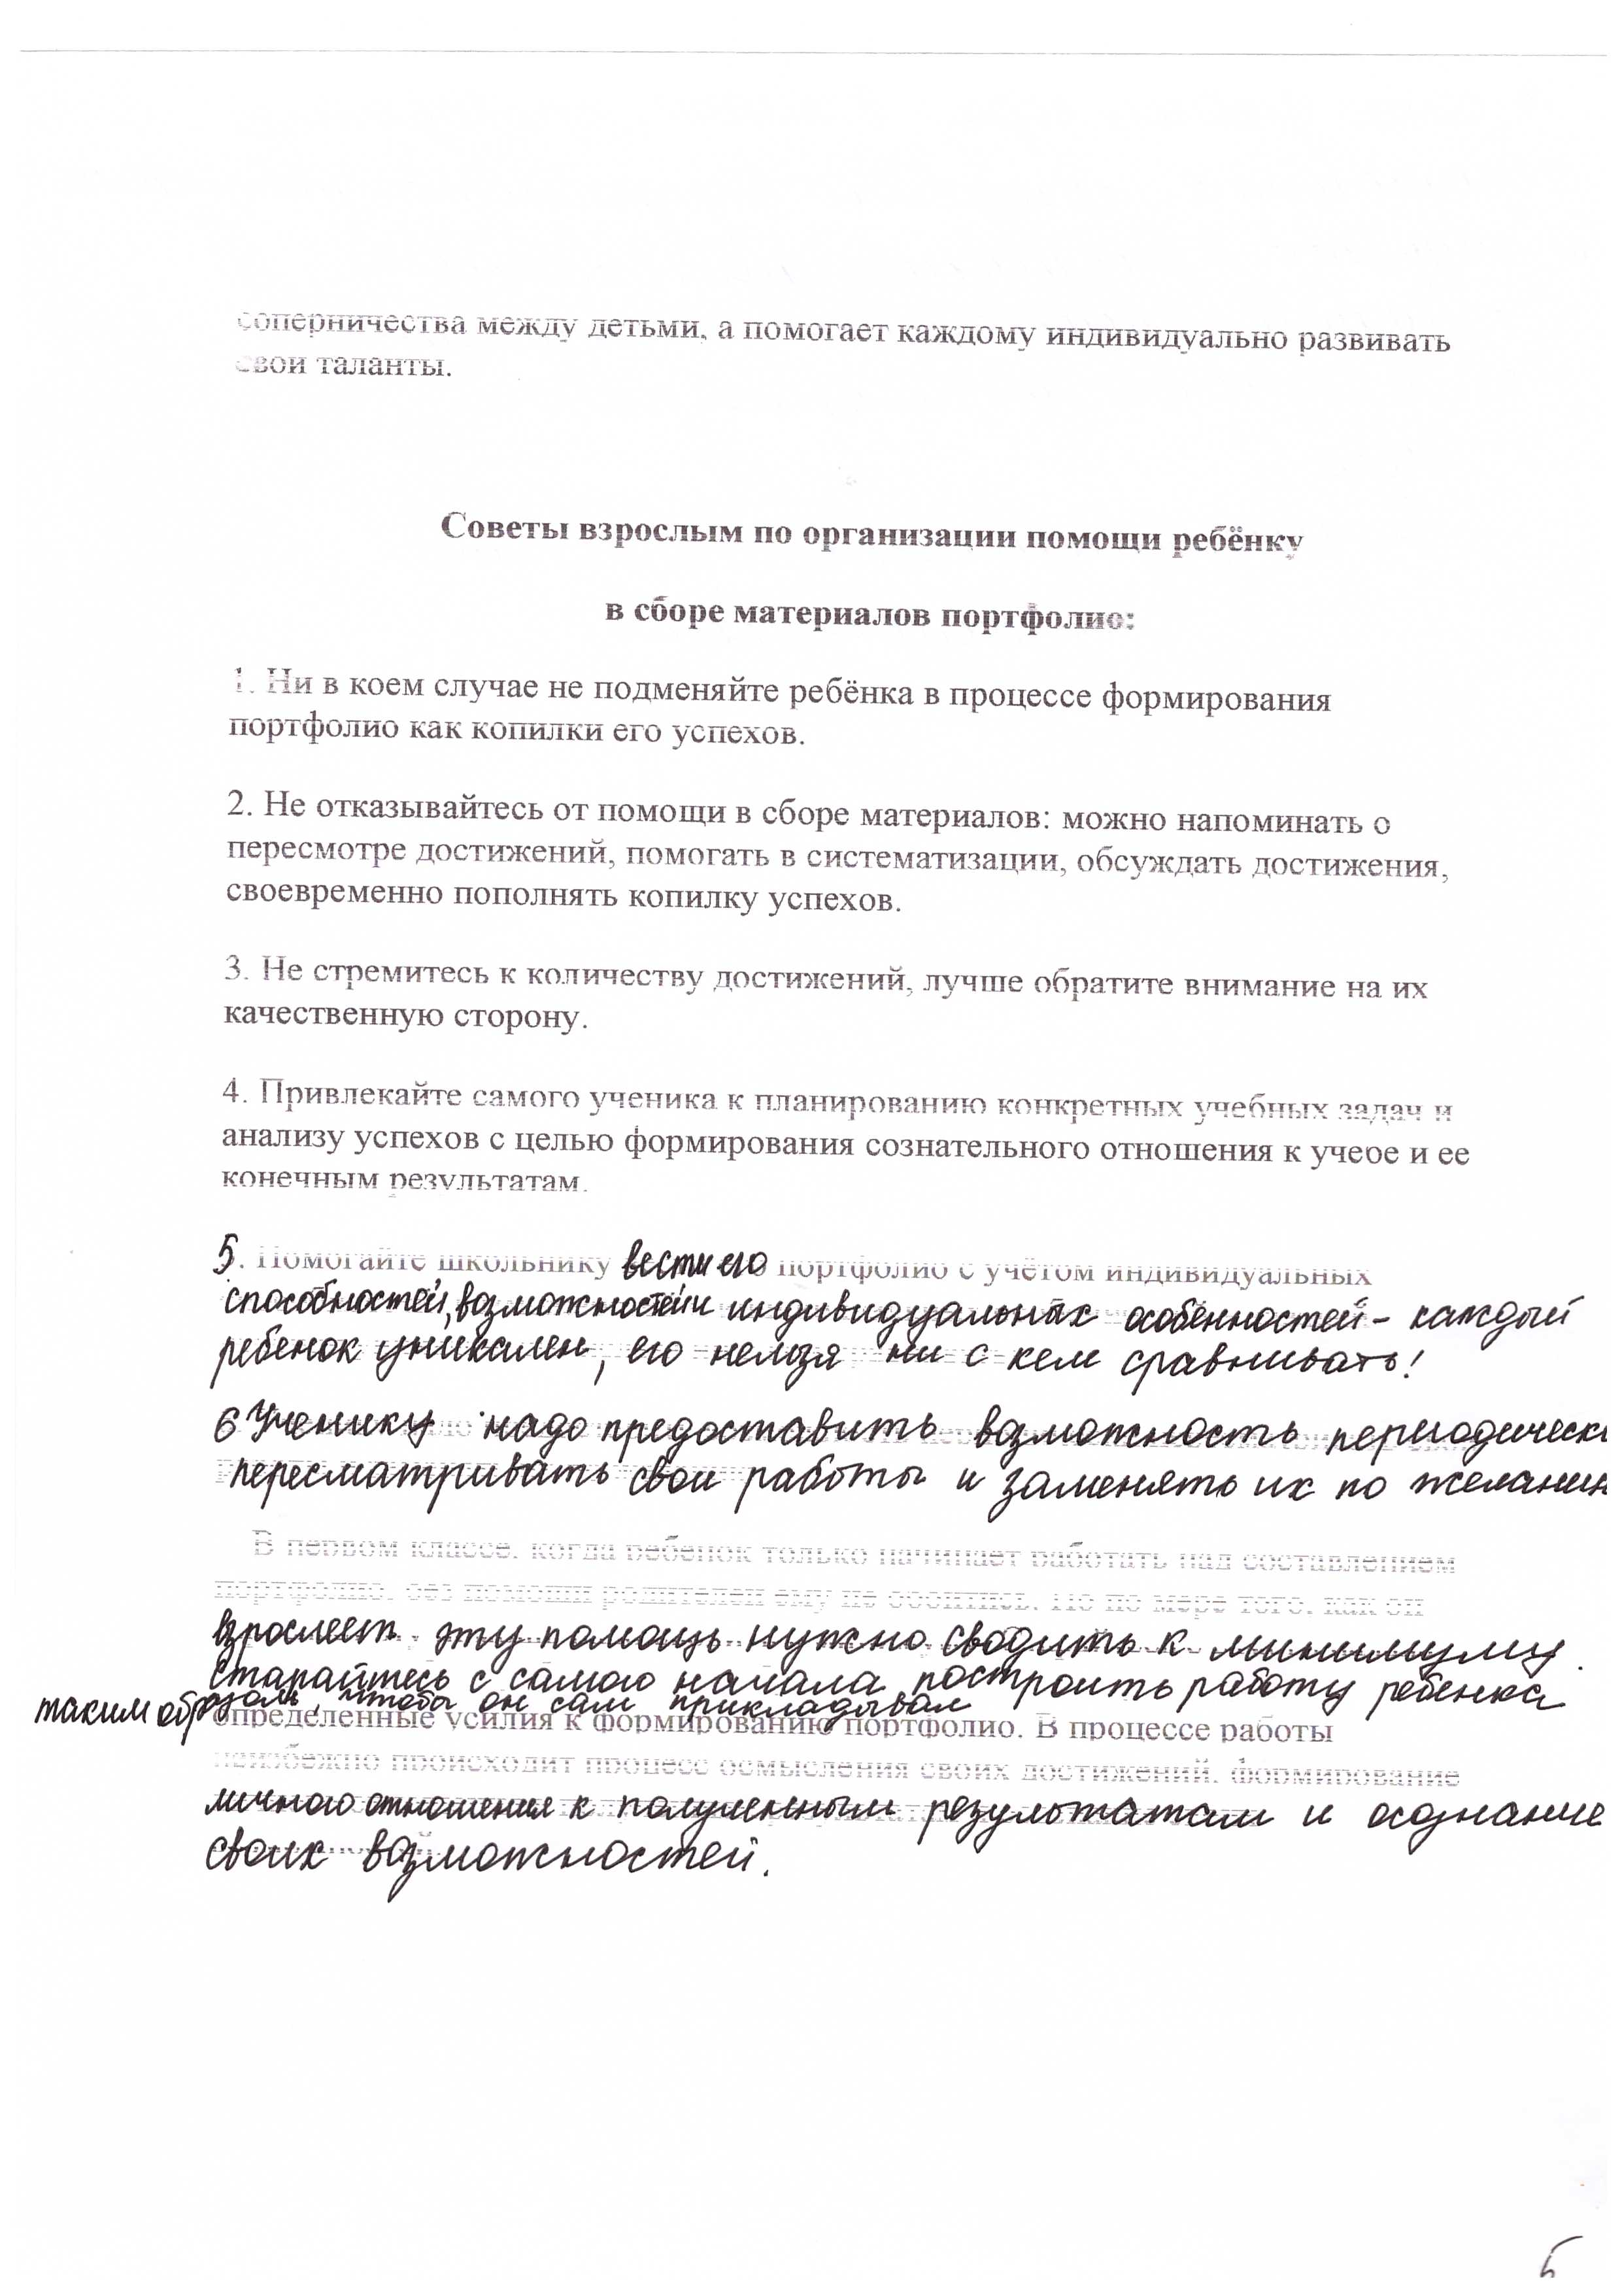 C:\Documents and Settings\Админ\Мои документы\стр.5..jpeg